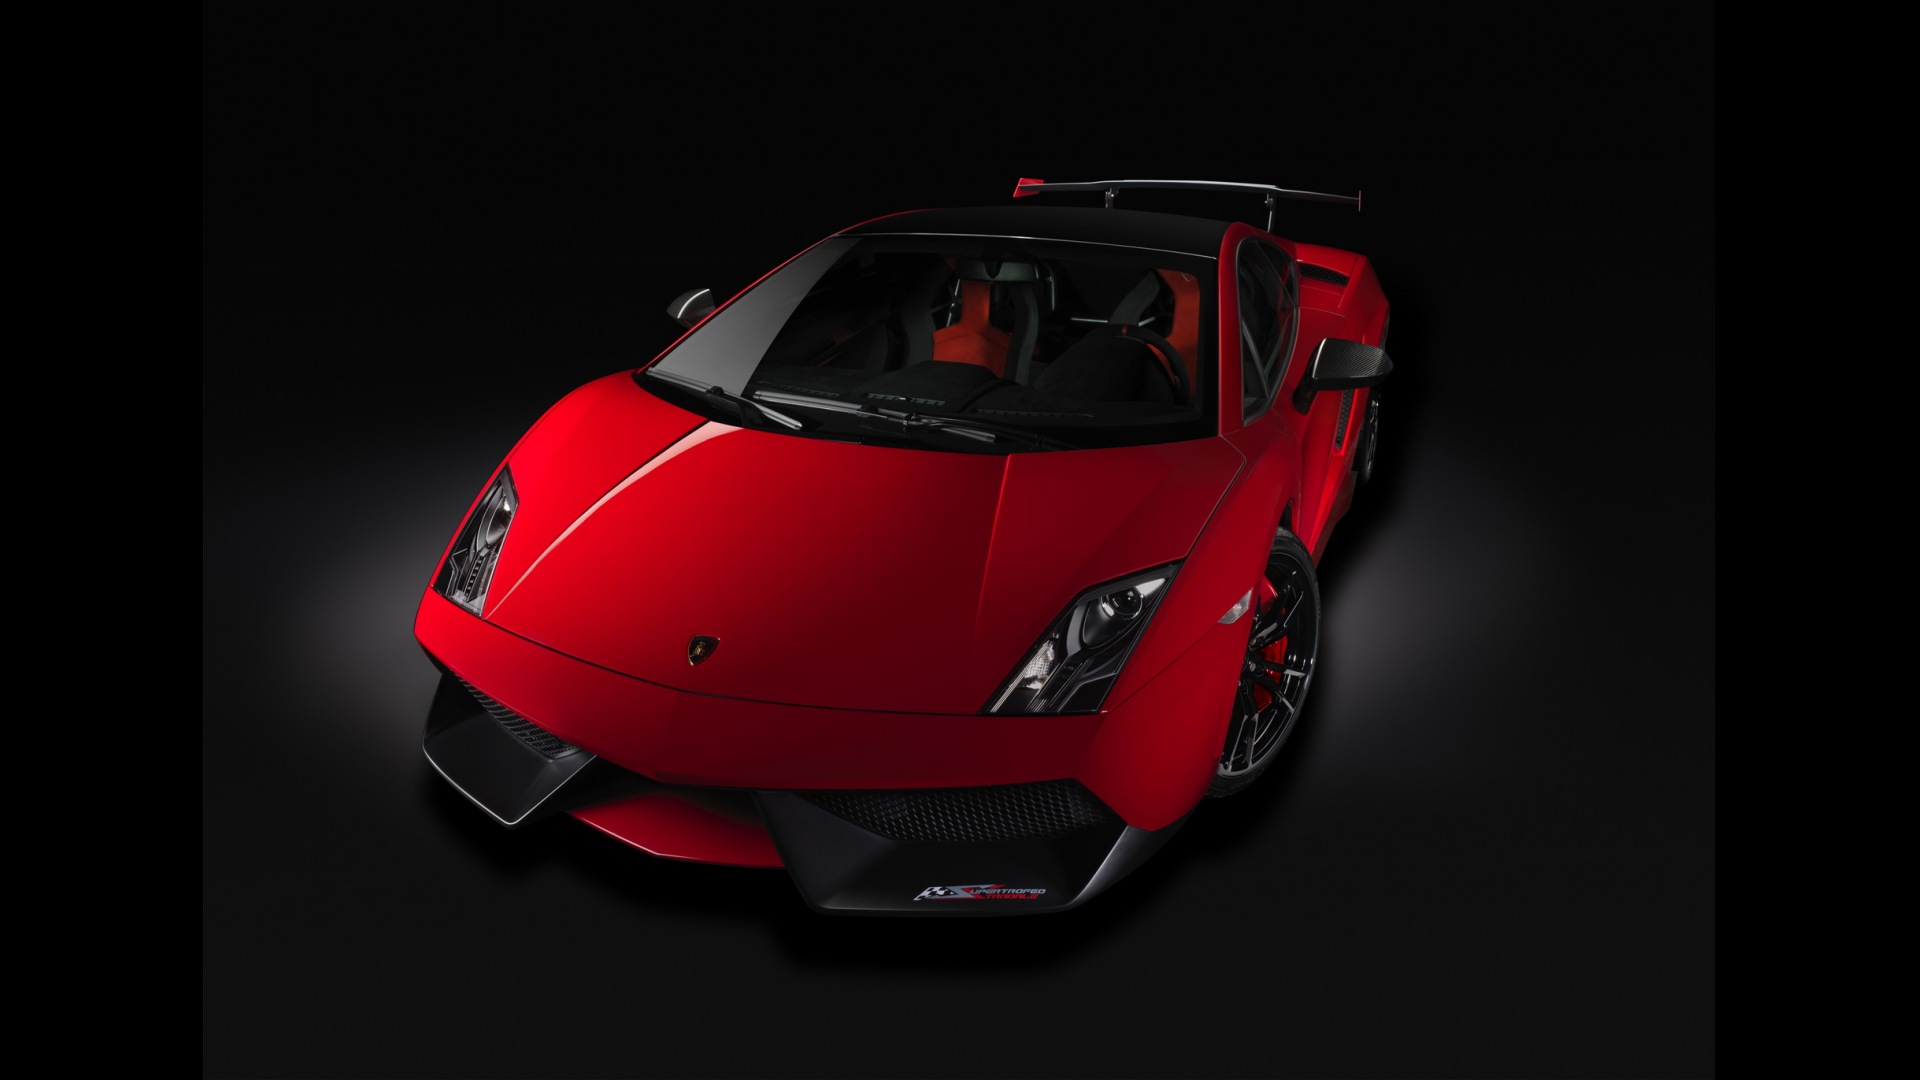 Red And Black Lamborghini Wallpaper 24 Background ...